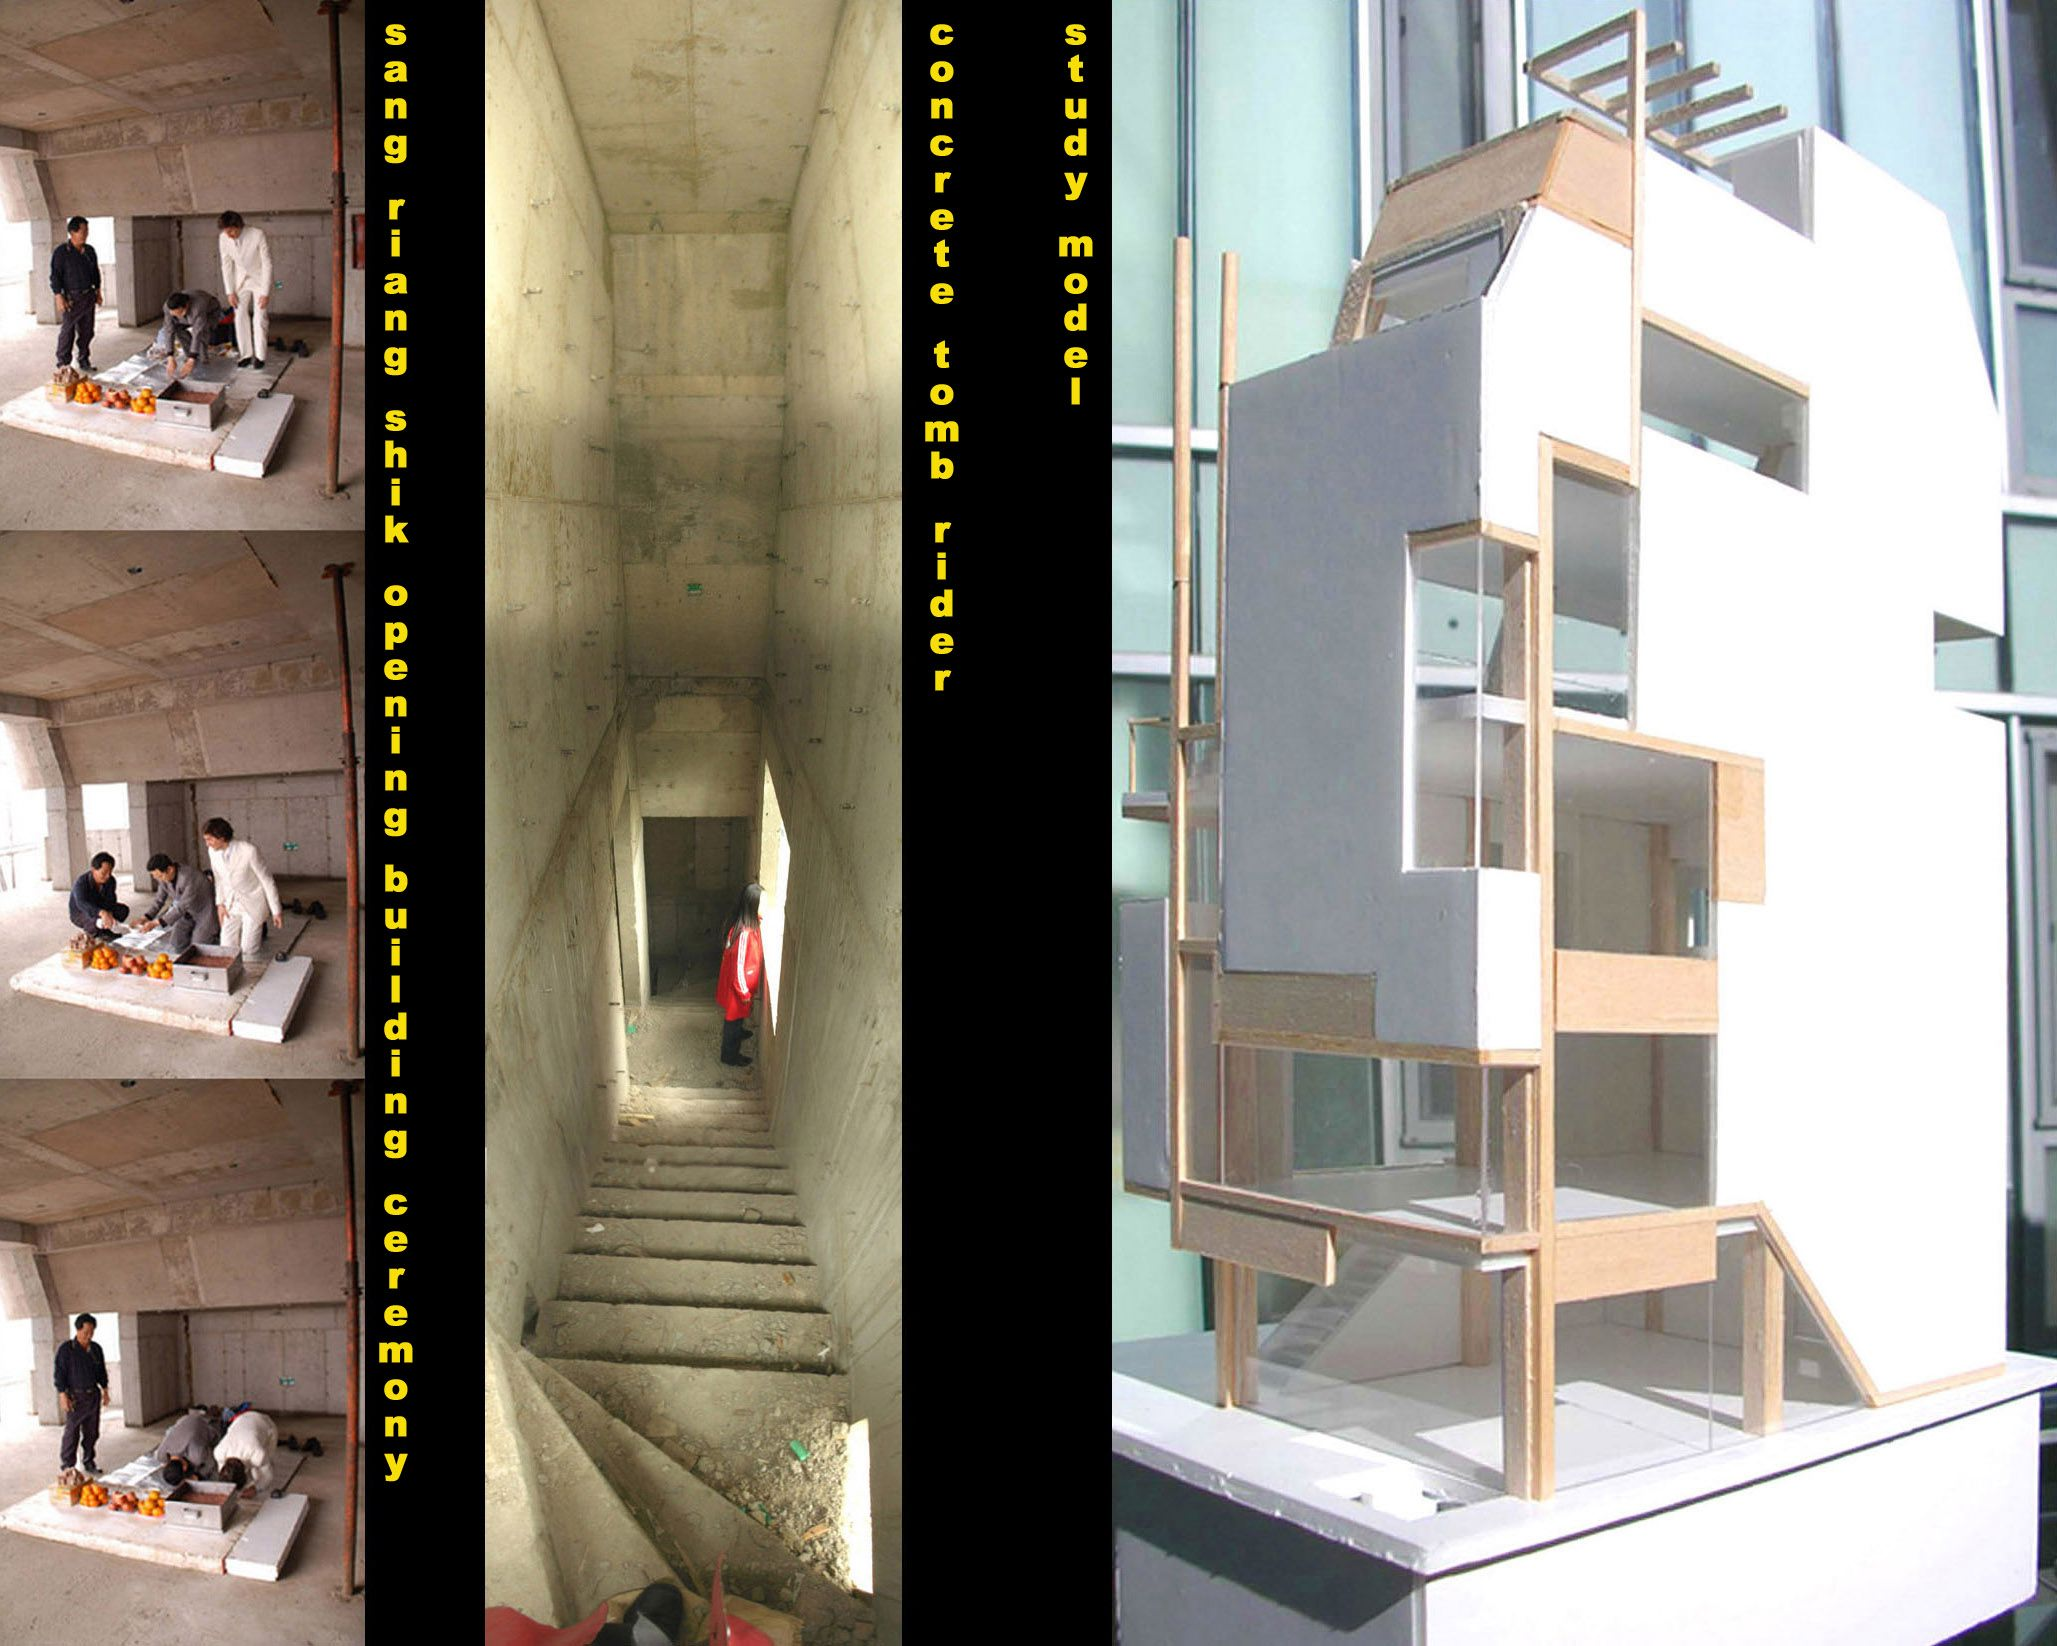 08 jamwon 40.6 ceremony + construction + model.jpg